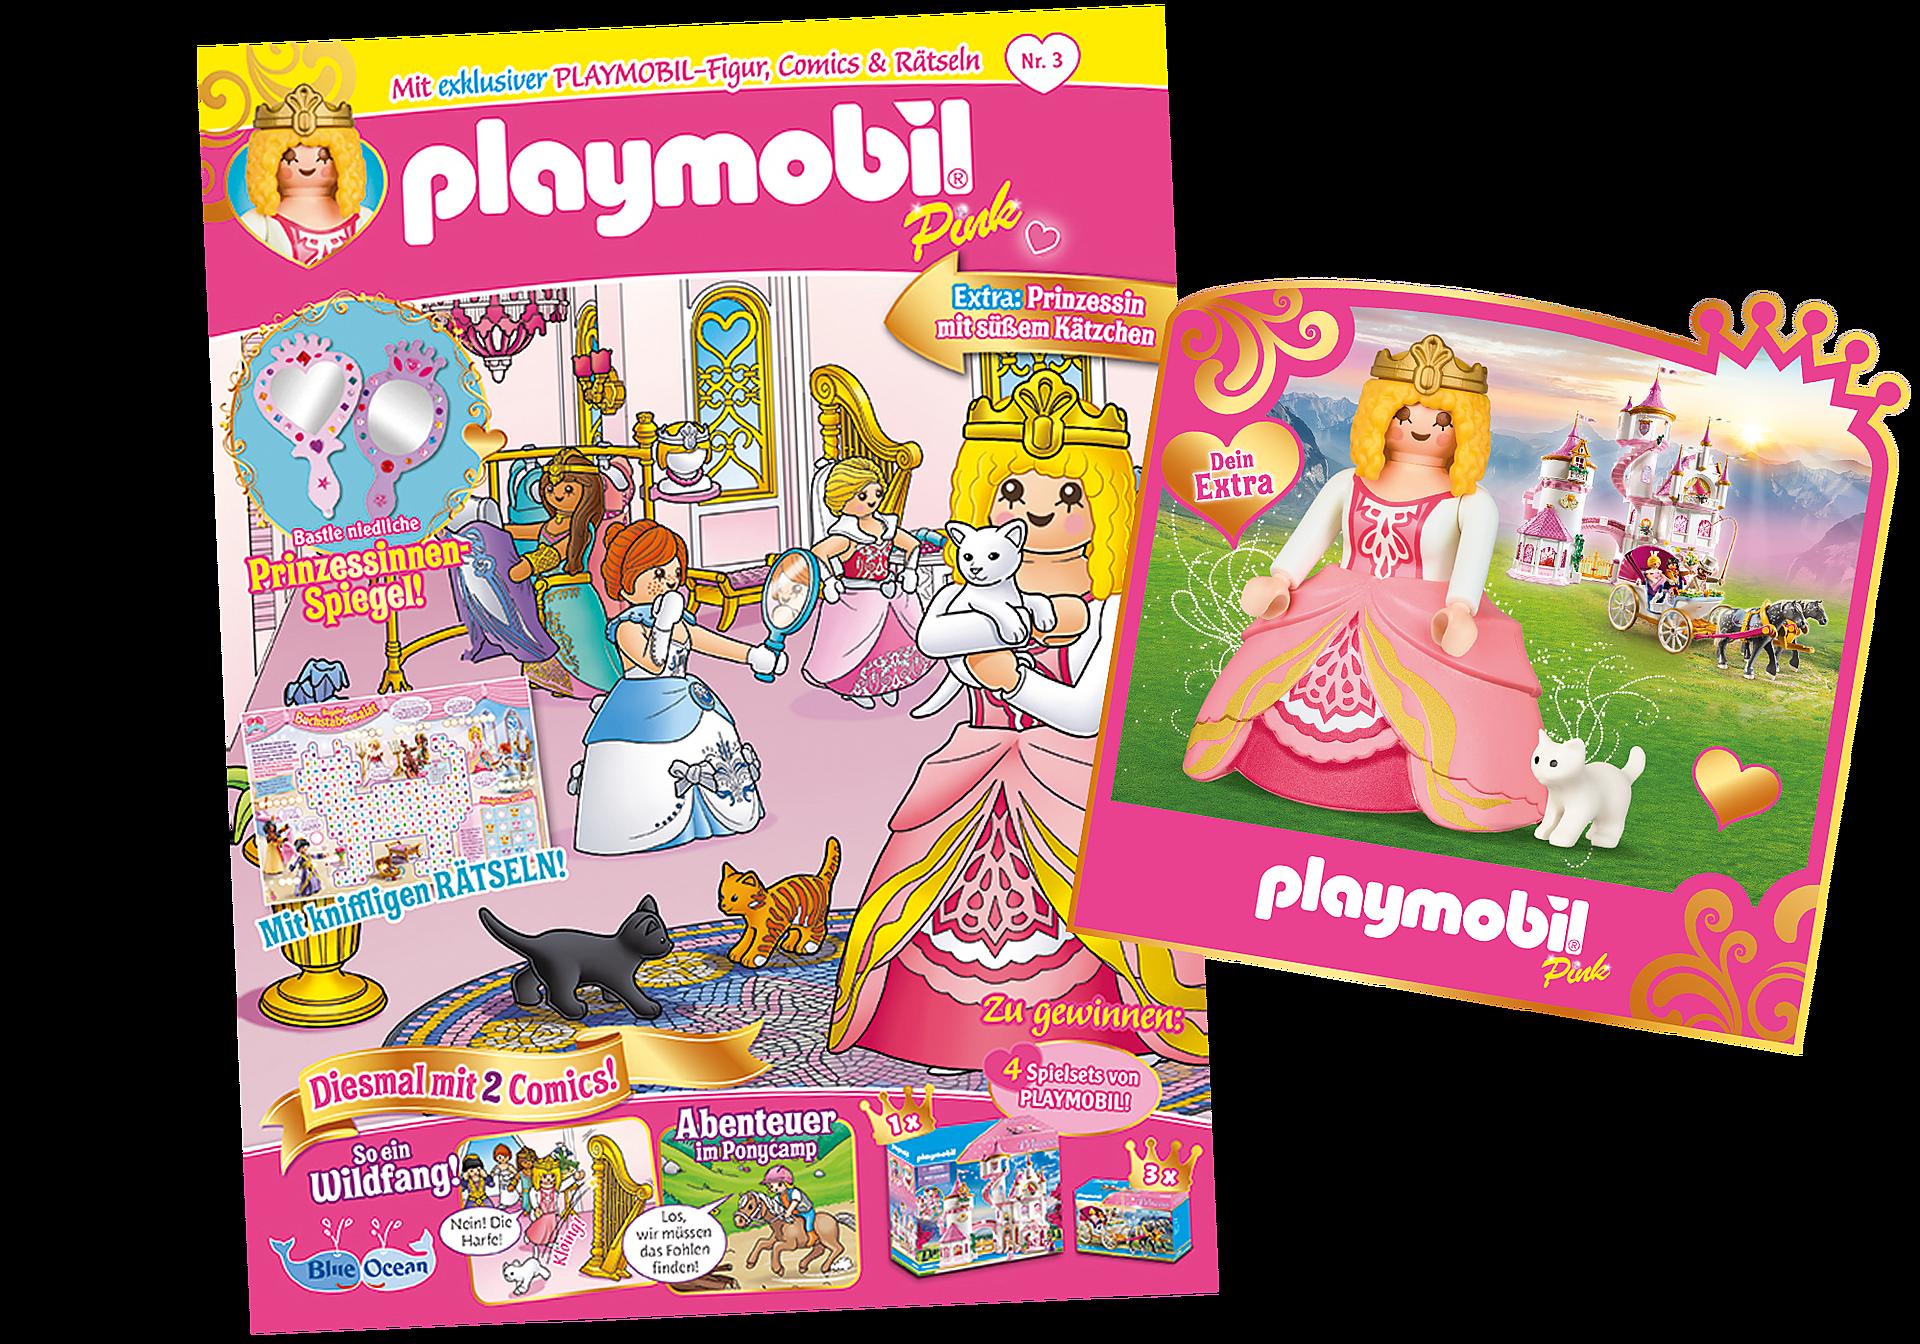 80678 PLAYMOBIL-Magazin Pink 3/2021 (Heft 61) zoom image1